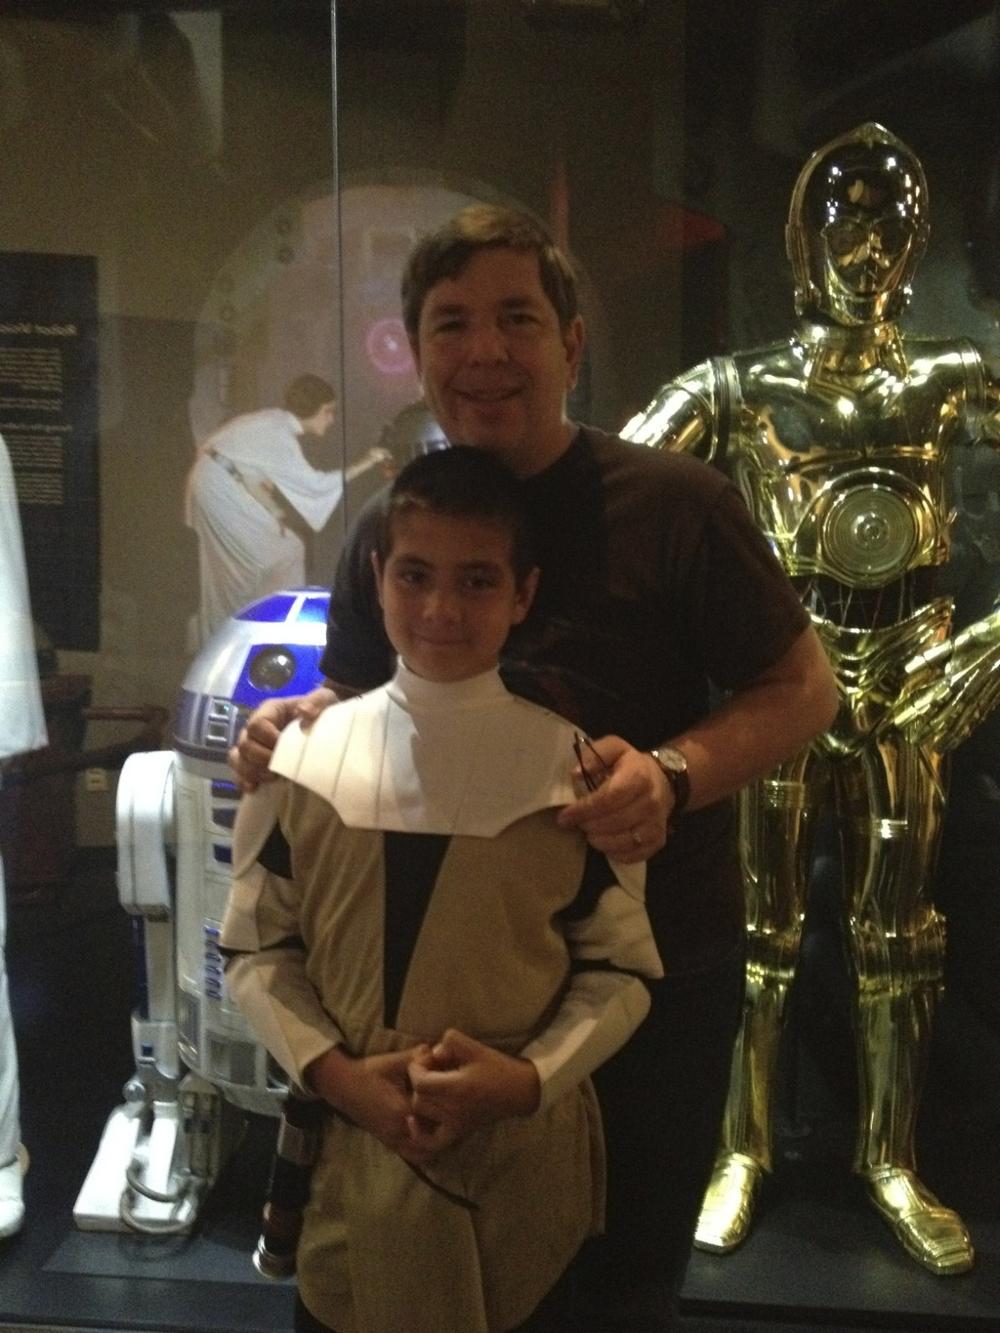 Me and Jedi Logan